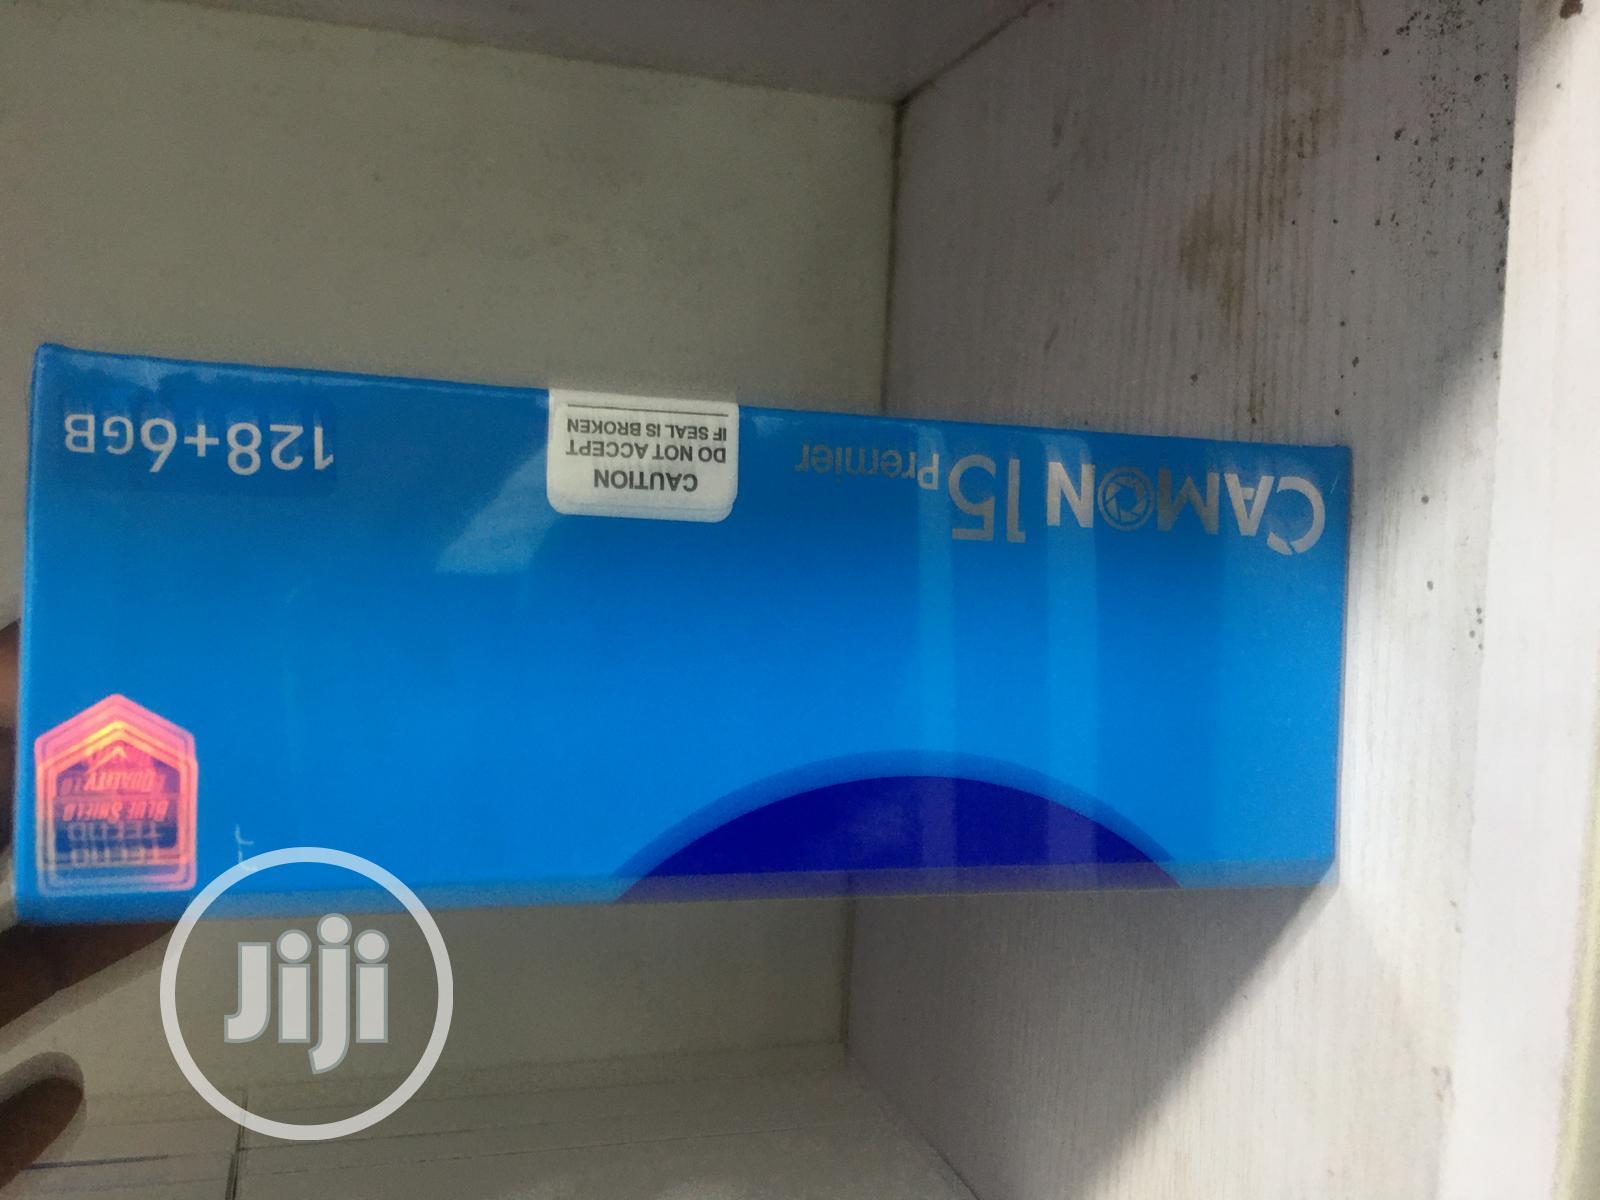 New Tecno Camon 15 Premier 128 GB   Mobile Phones for sale in Ikeja, Lagos State, Nigeria